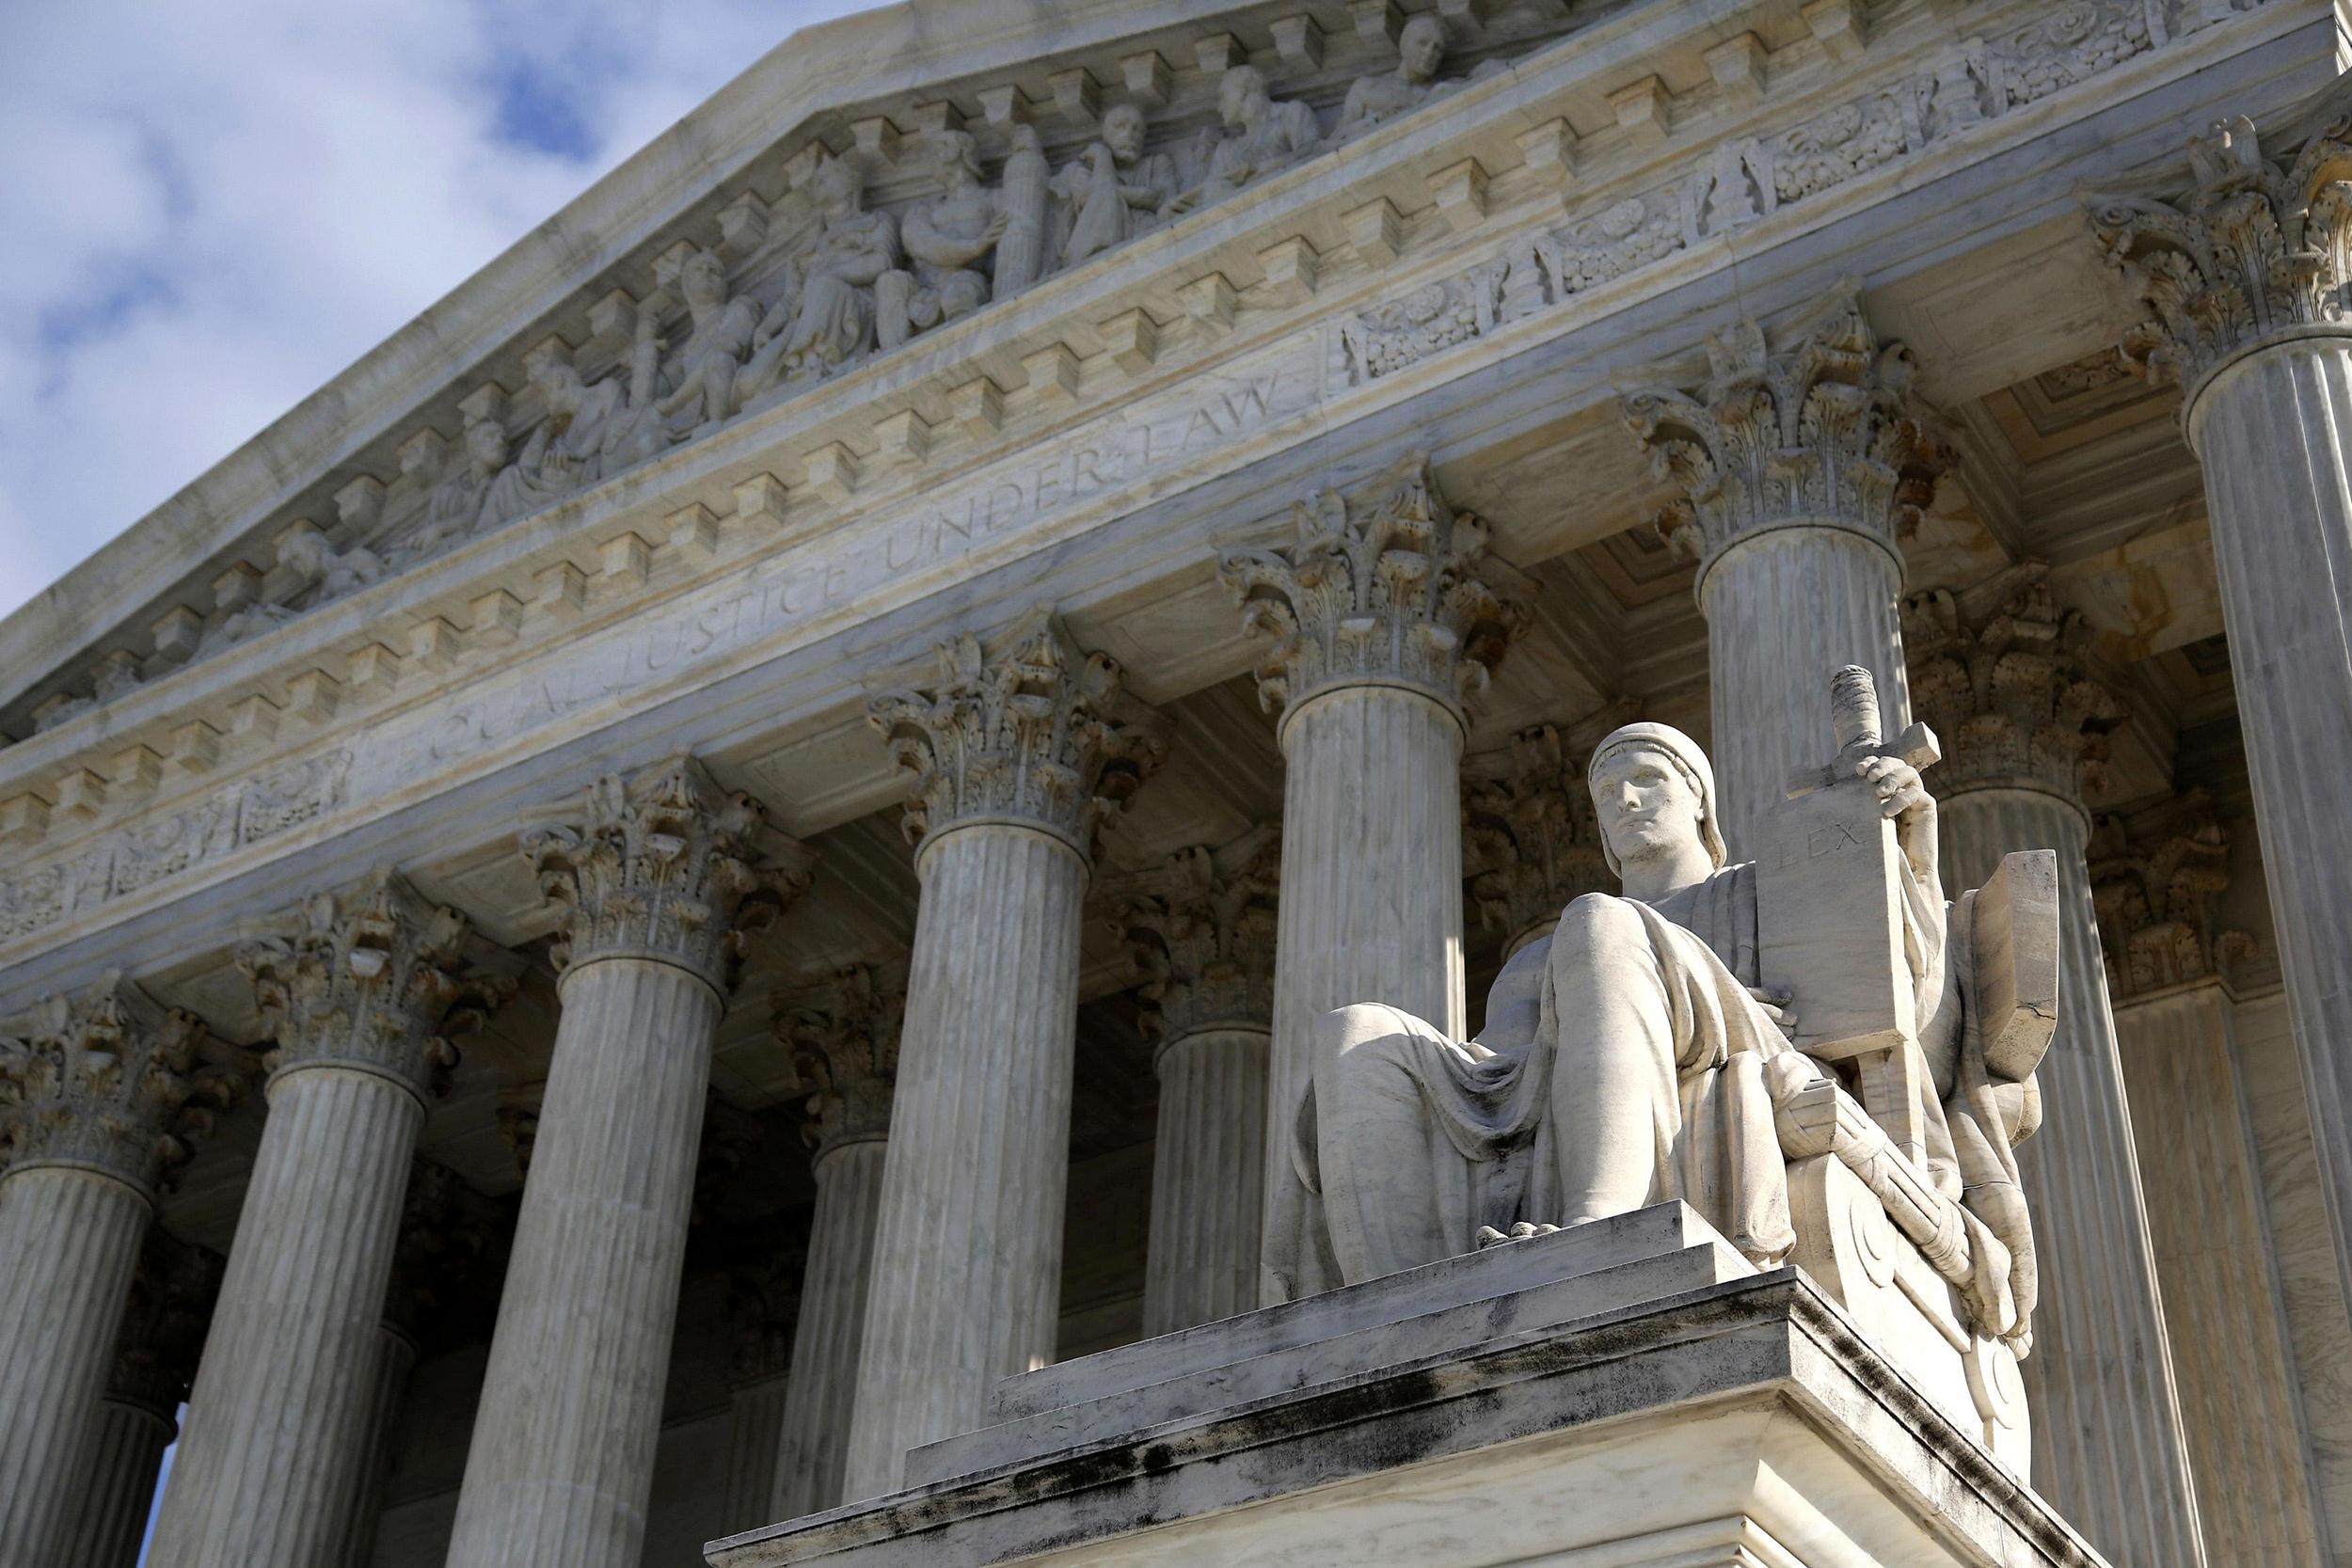 Image: The U.S. Supreme Court in Washington on Dec. 3, 2013.